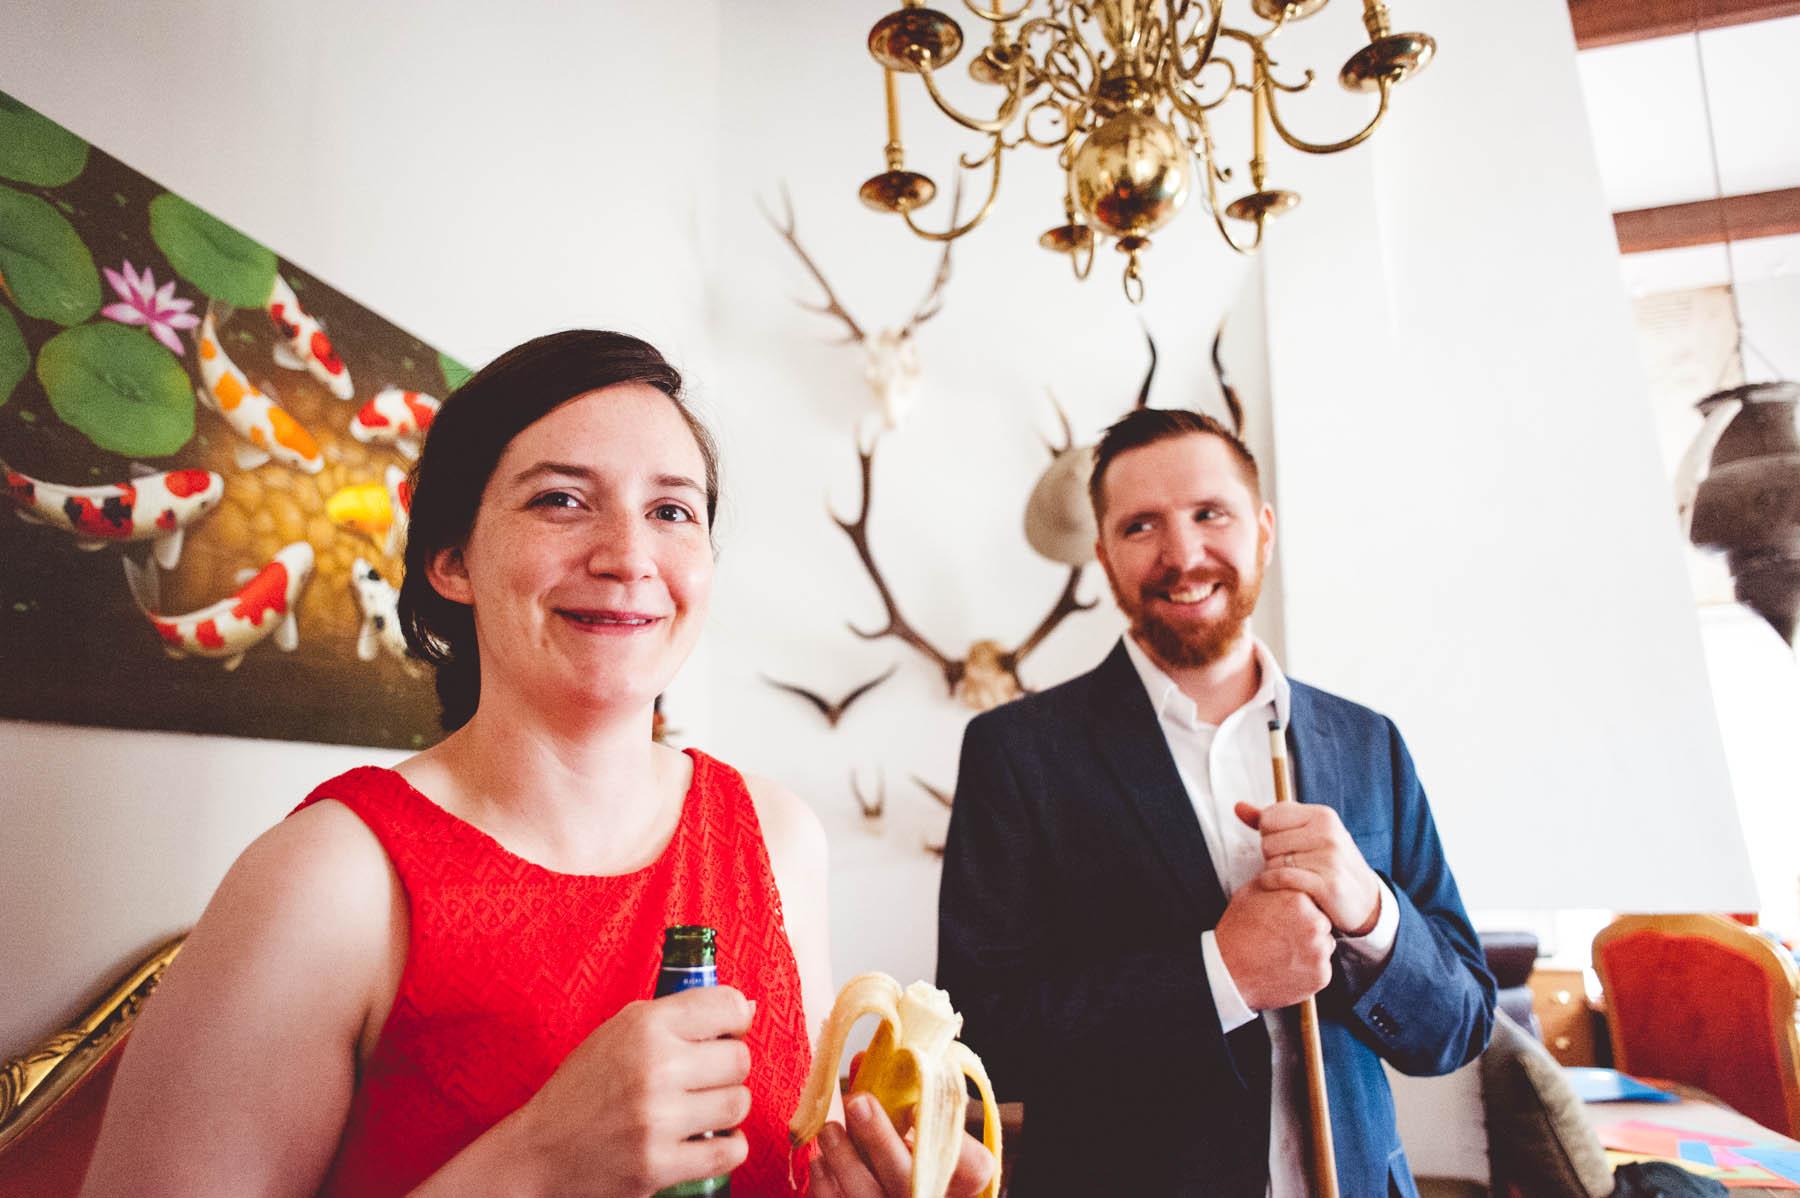 Photographe mariage original toulouse montpellier - M et S - Mademoiselle G Photographie (43)